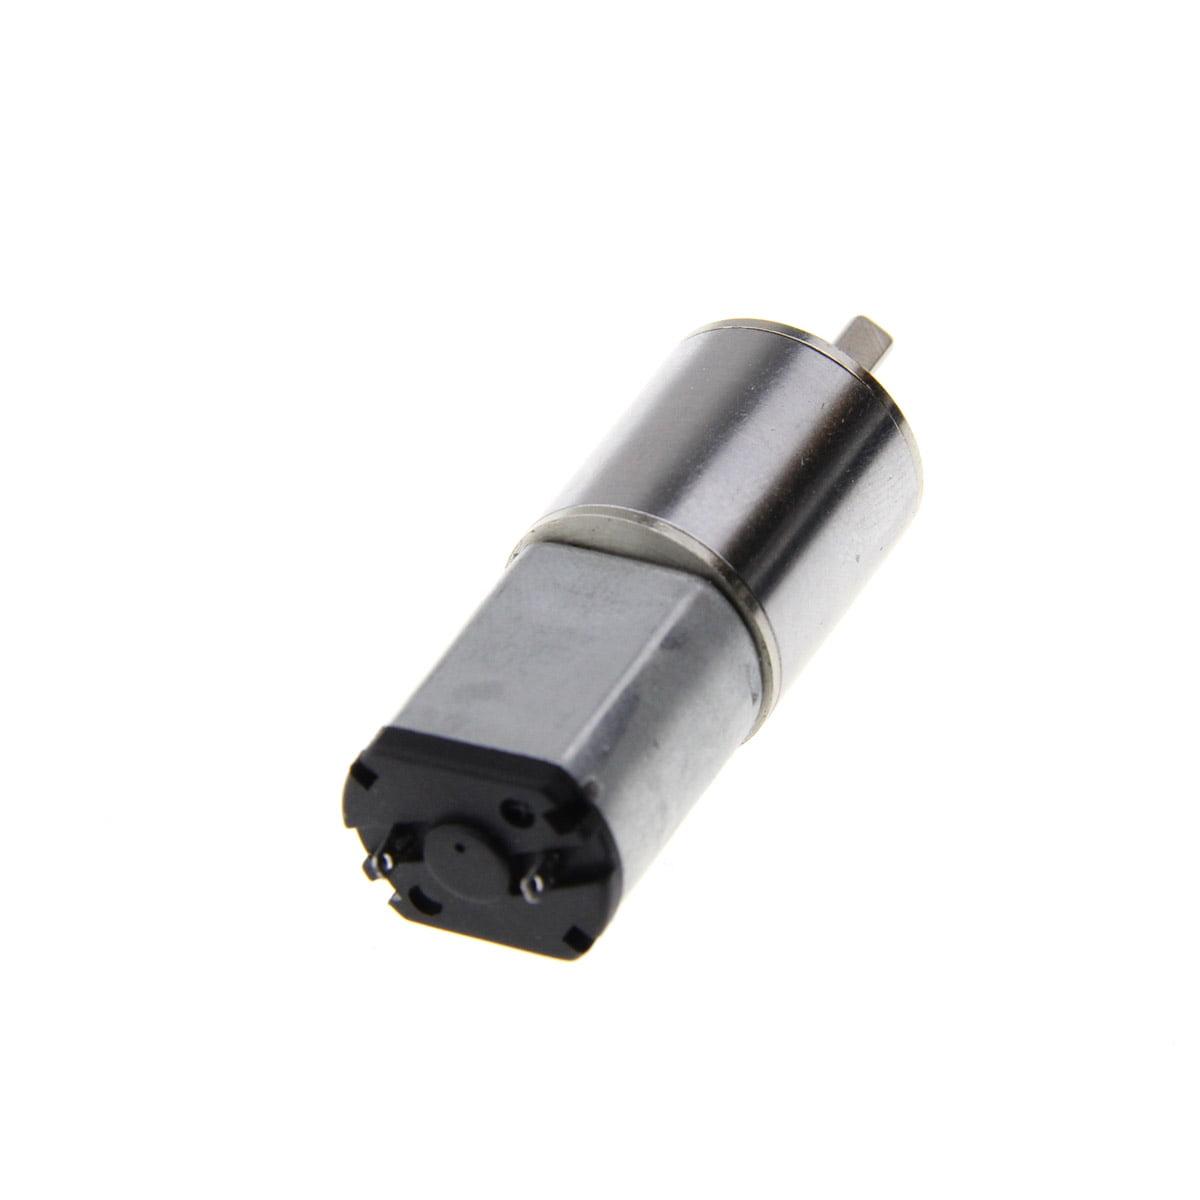 Gear Motor for Robot 6V 60RPM Miniature Dust-Resistant Torque DC Gear Motor